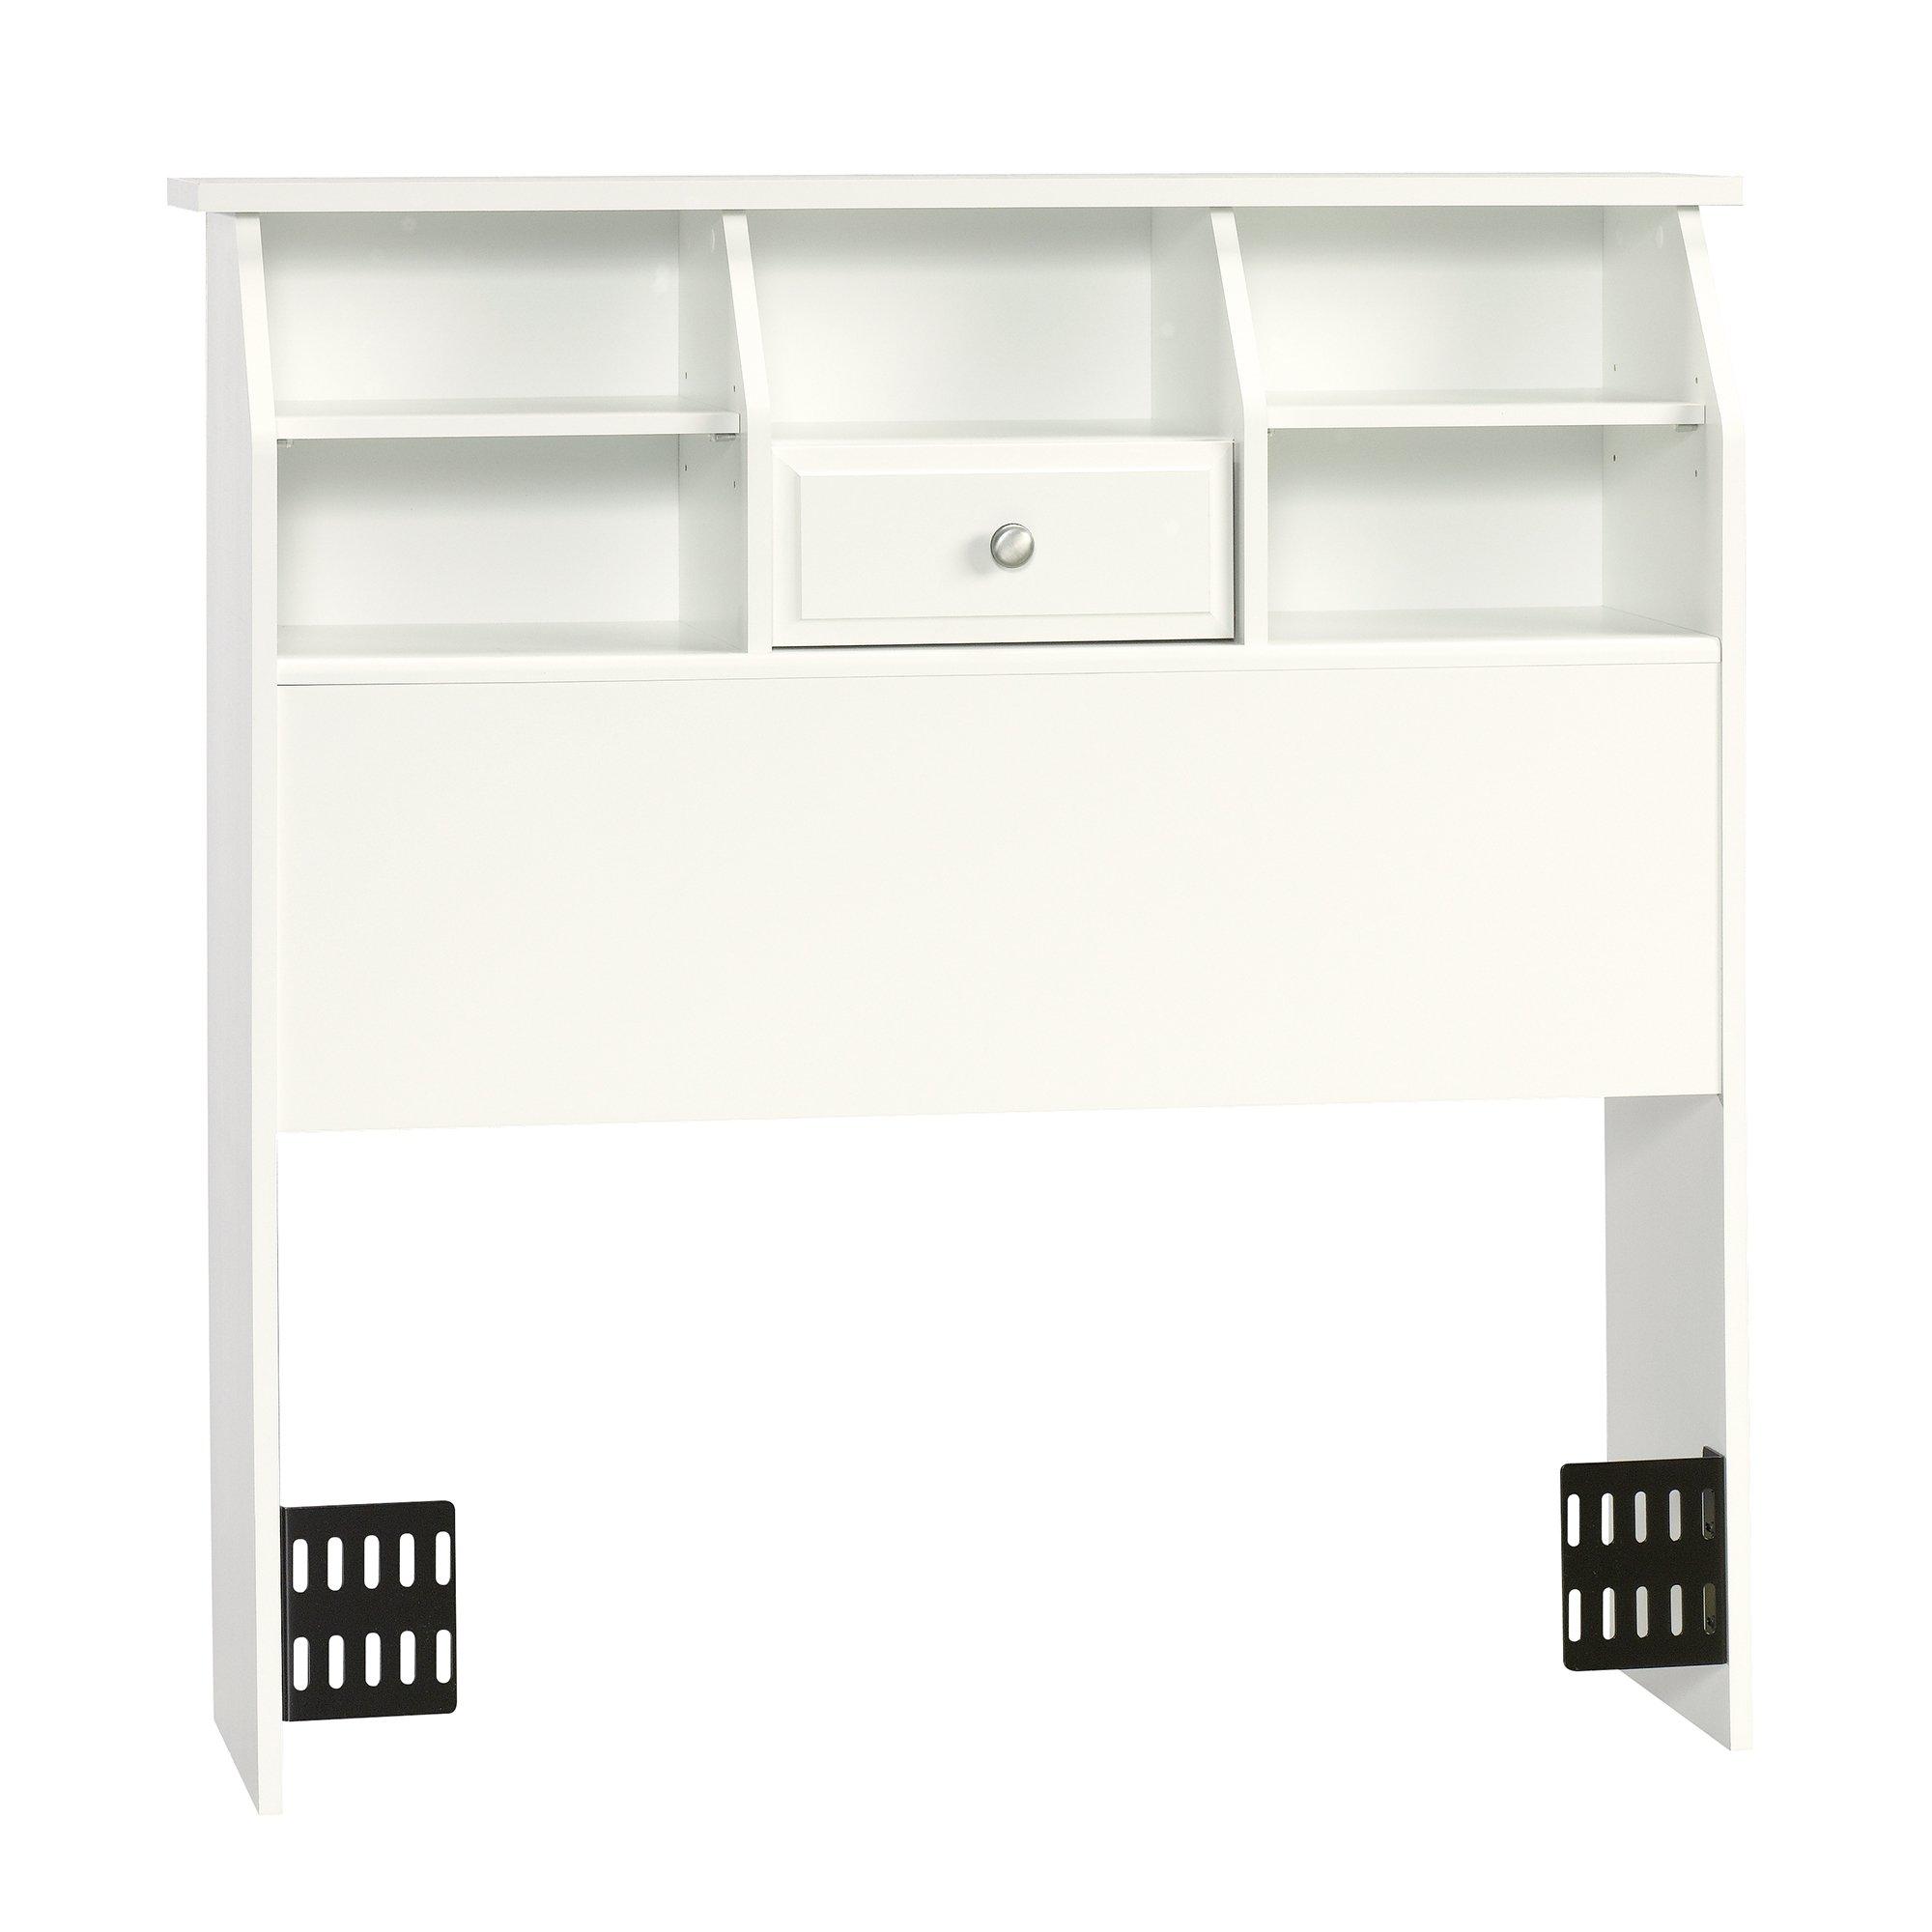 Sauder Shoal Creek Bookcase Headboard with Soft White Finish, Twin